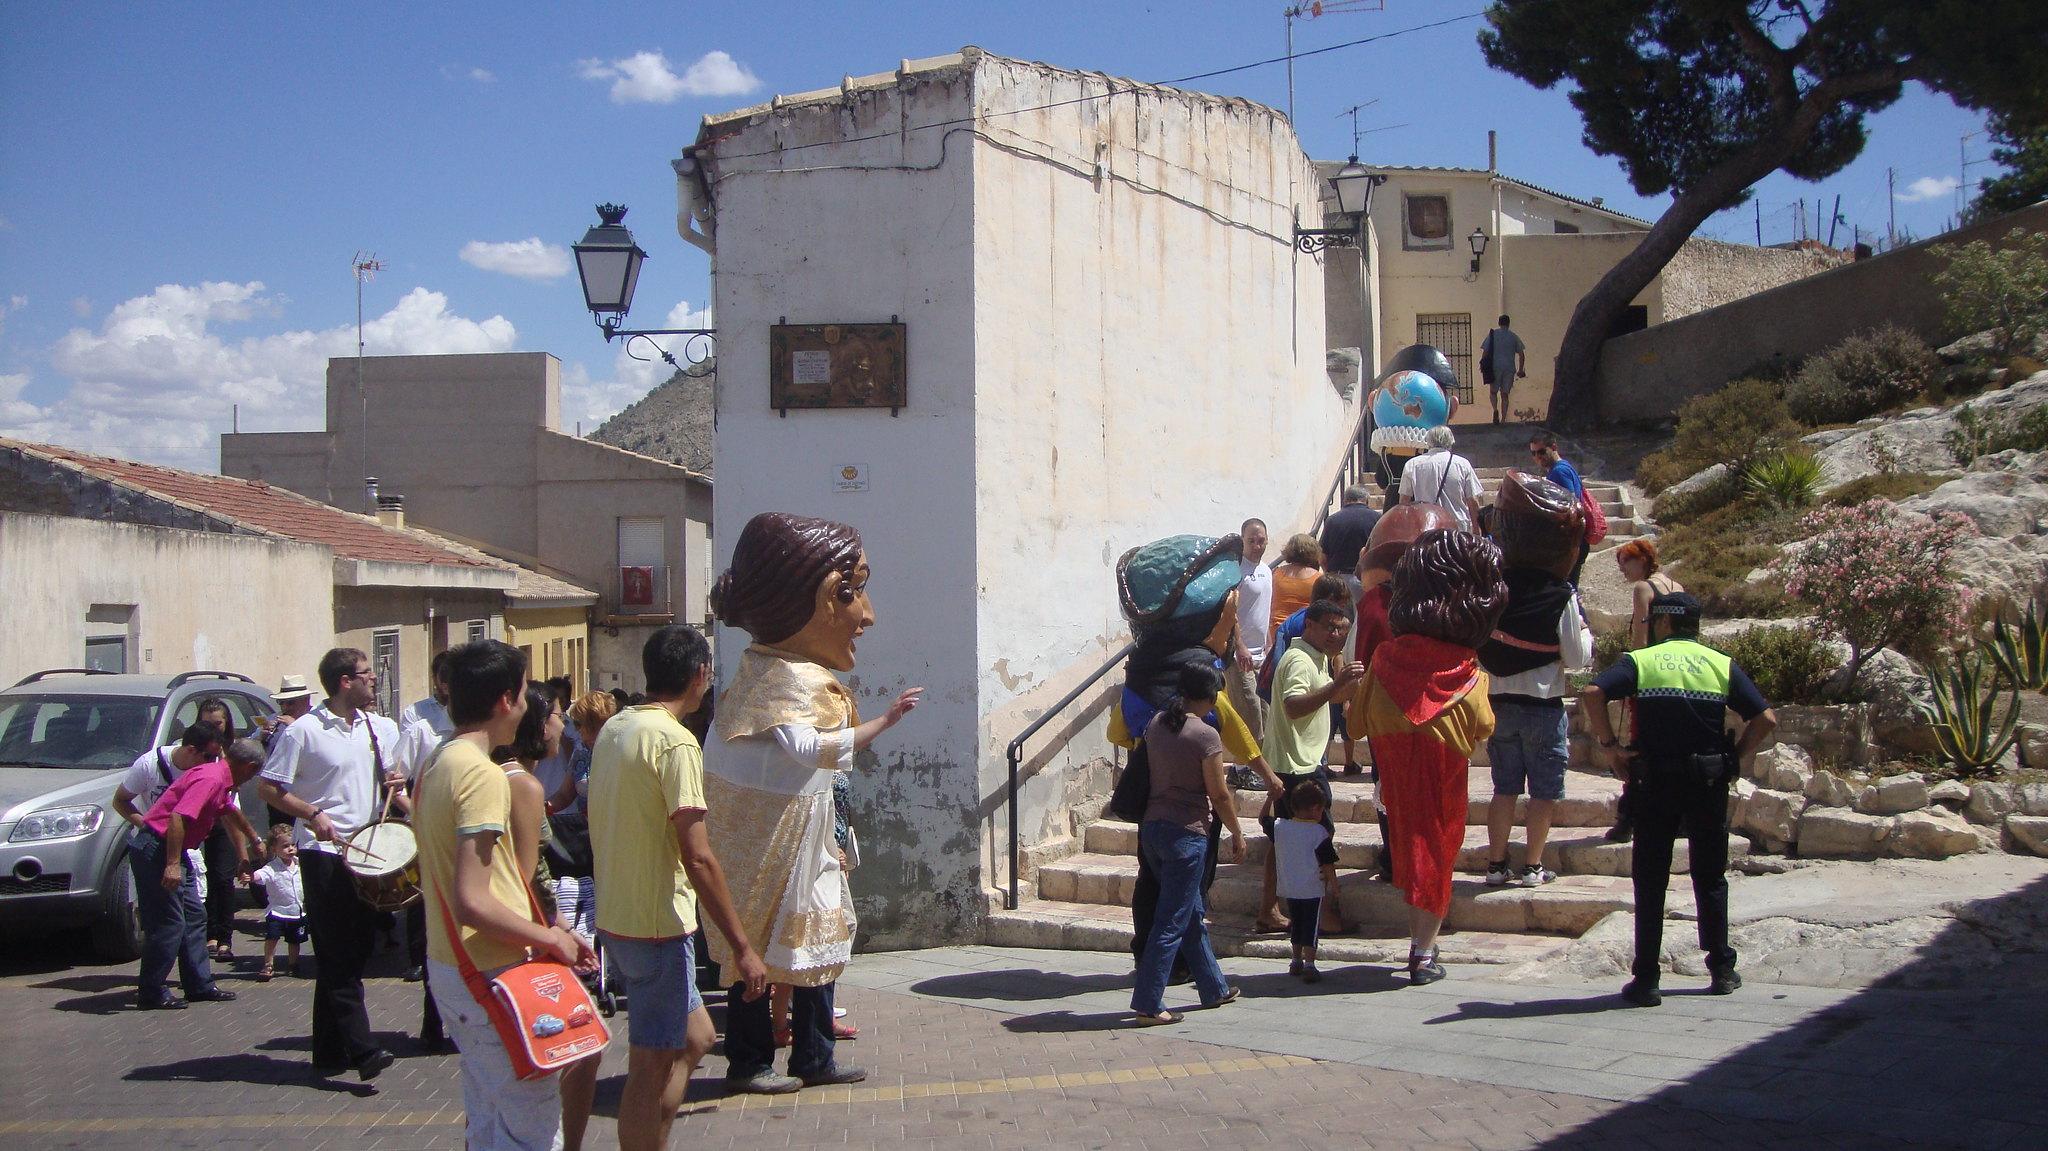 (2012-07-01) - Pasacalle Gent de Nanos - Javier Montesinos Villaplana (02)